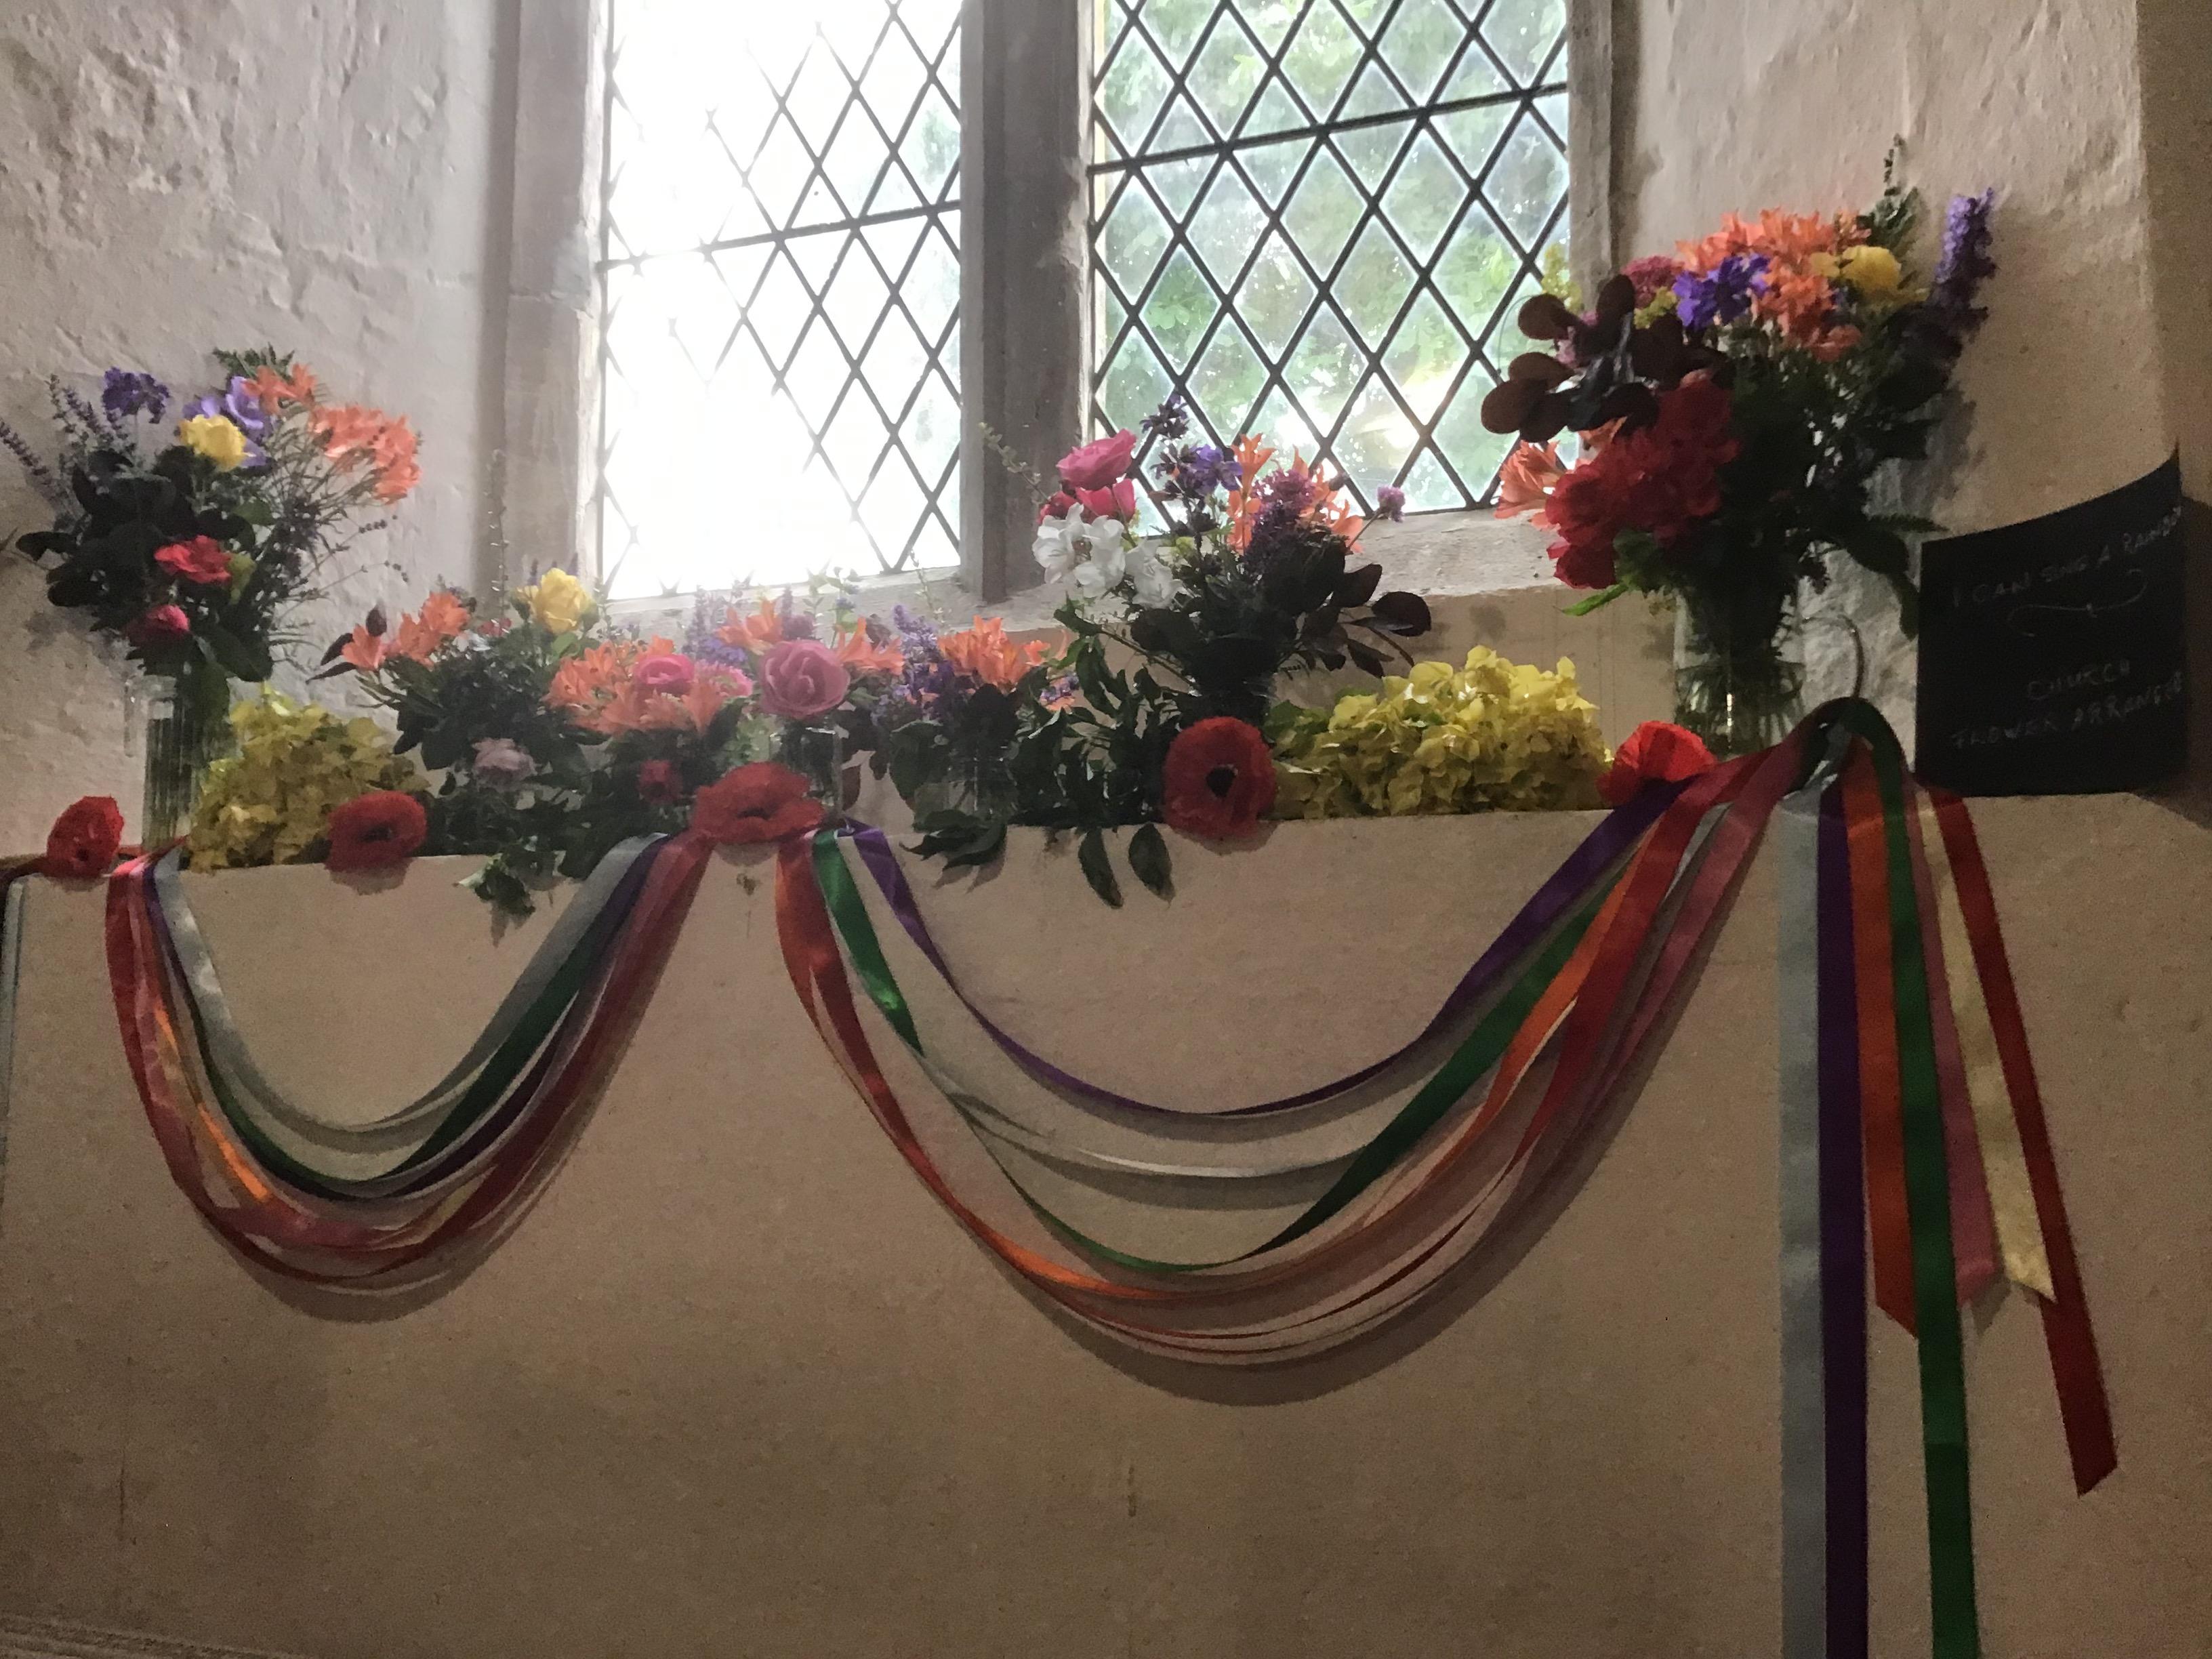 Patronal Flowers in Willersey Church June 2021